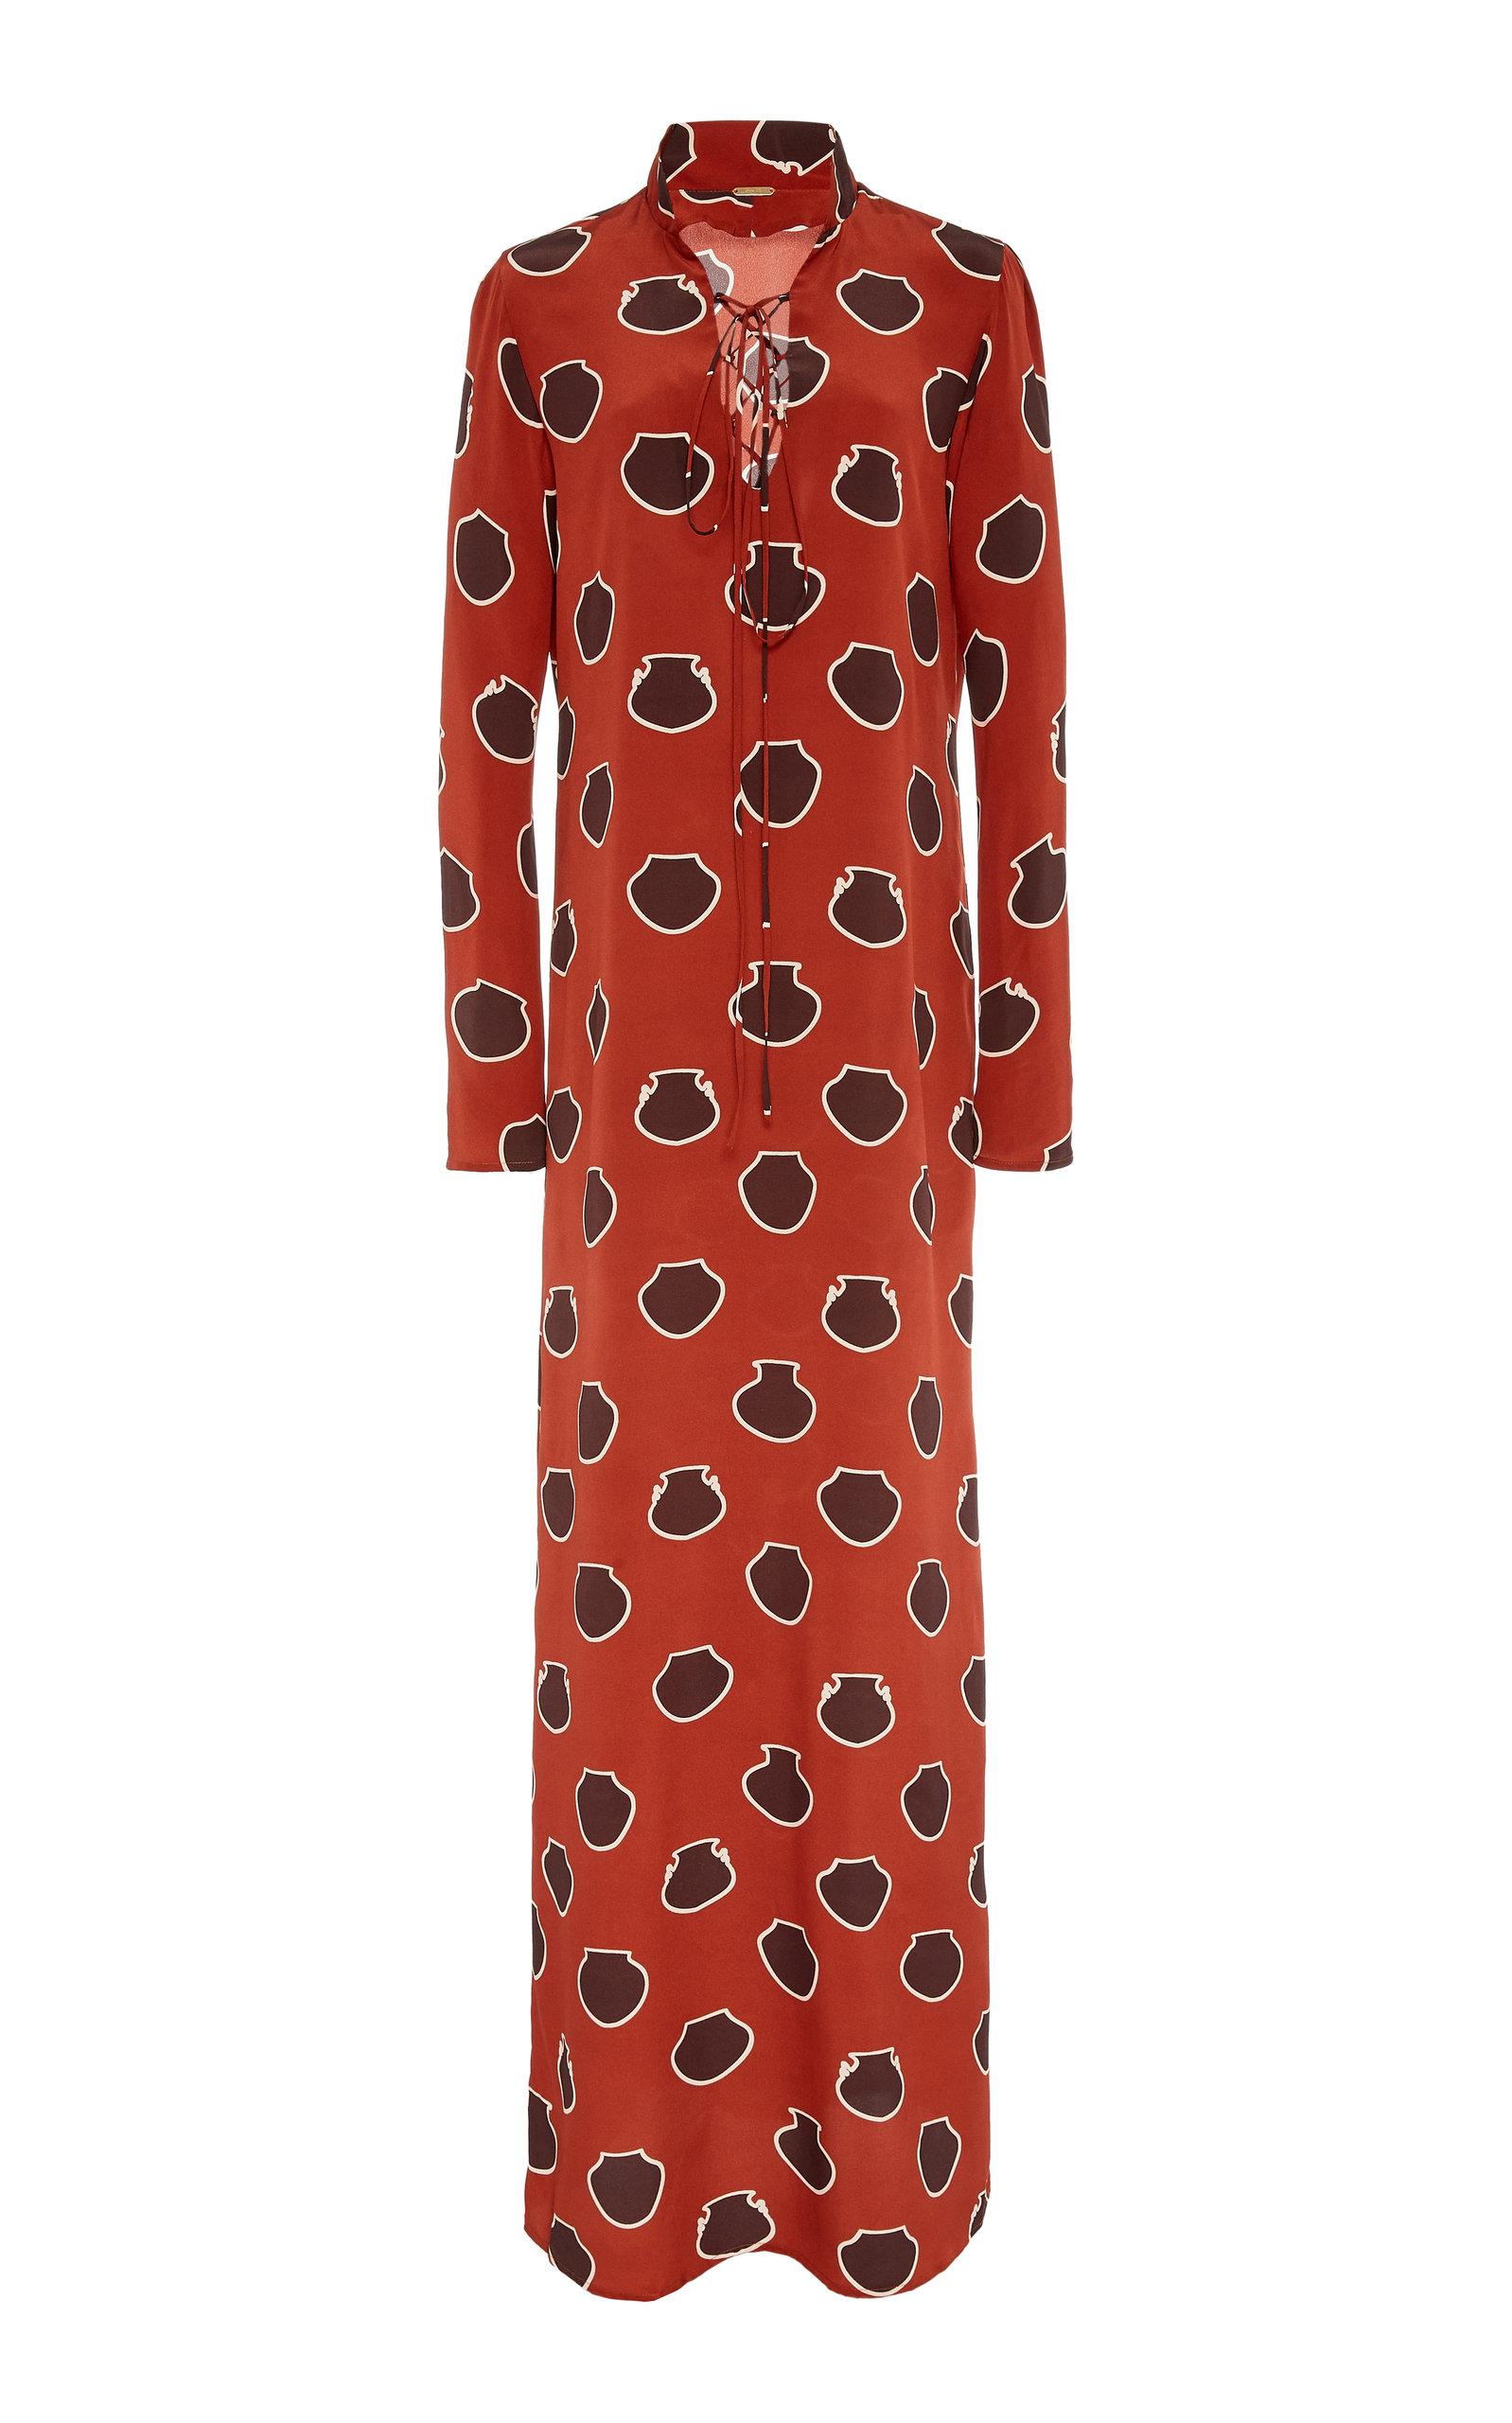 Buy Johanna Ortiz Lace-Up Polka-Dot Silk-Crepe De Chine Maxi Dress online, shop Johanna Ortiz at the best price